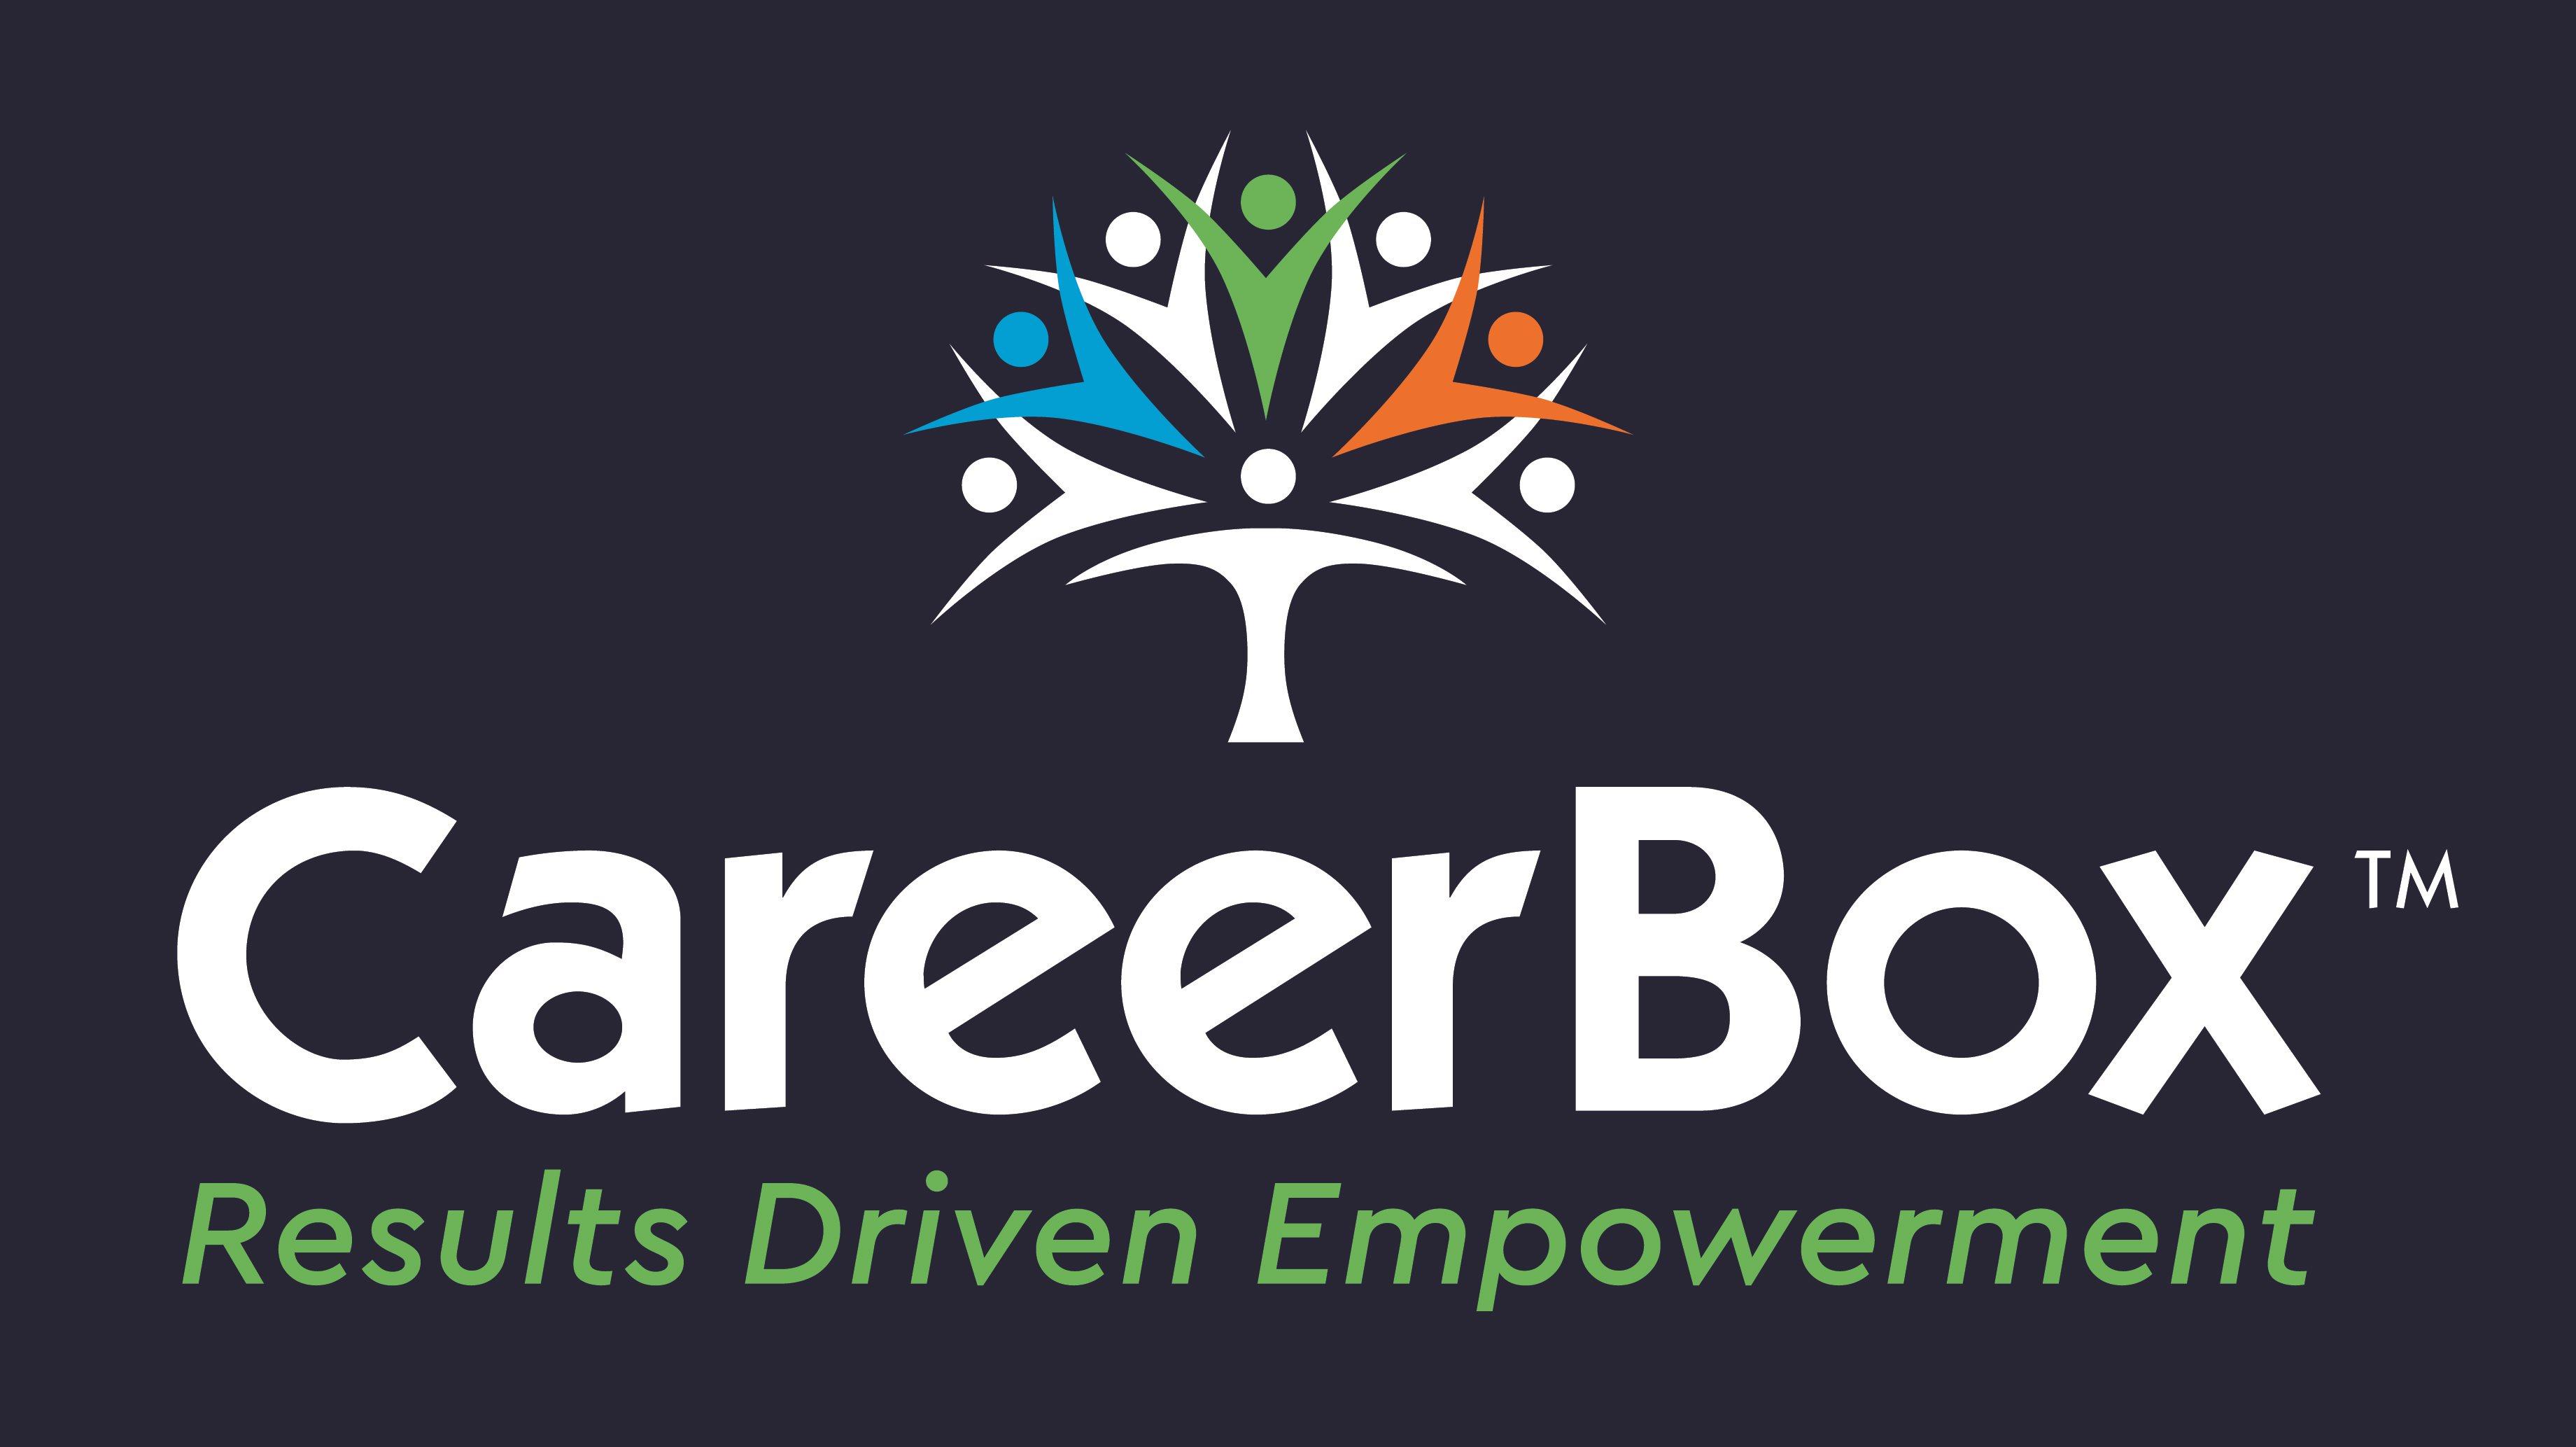 Careerbox